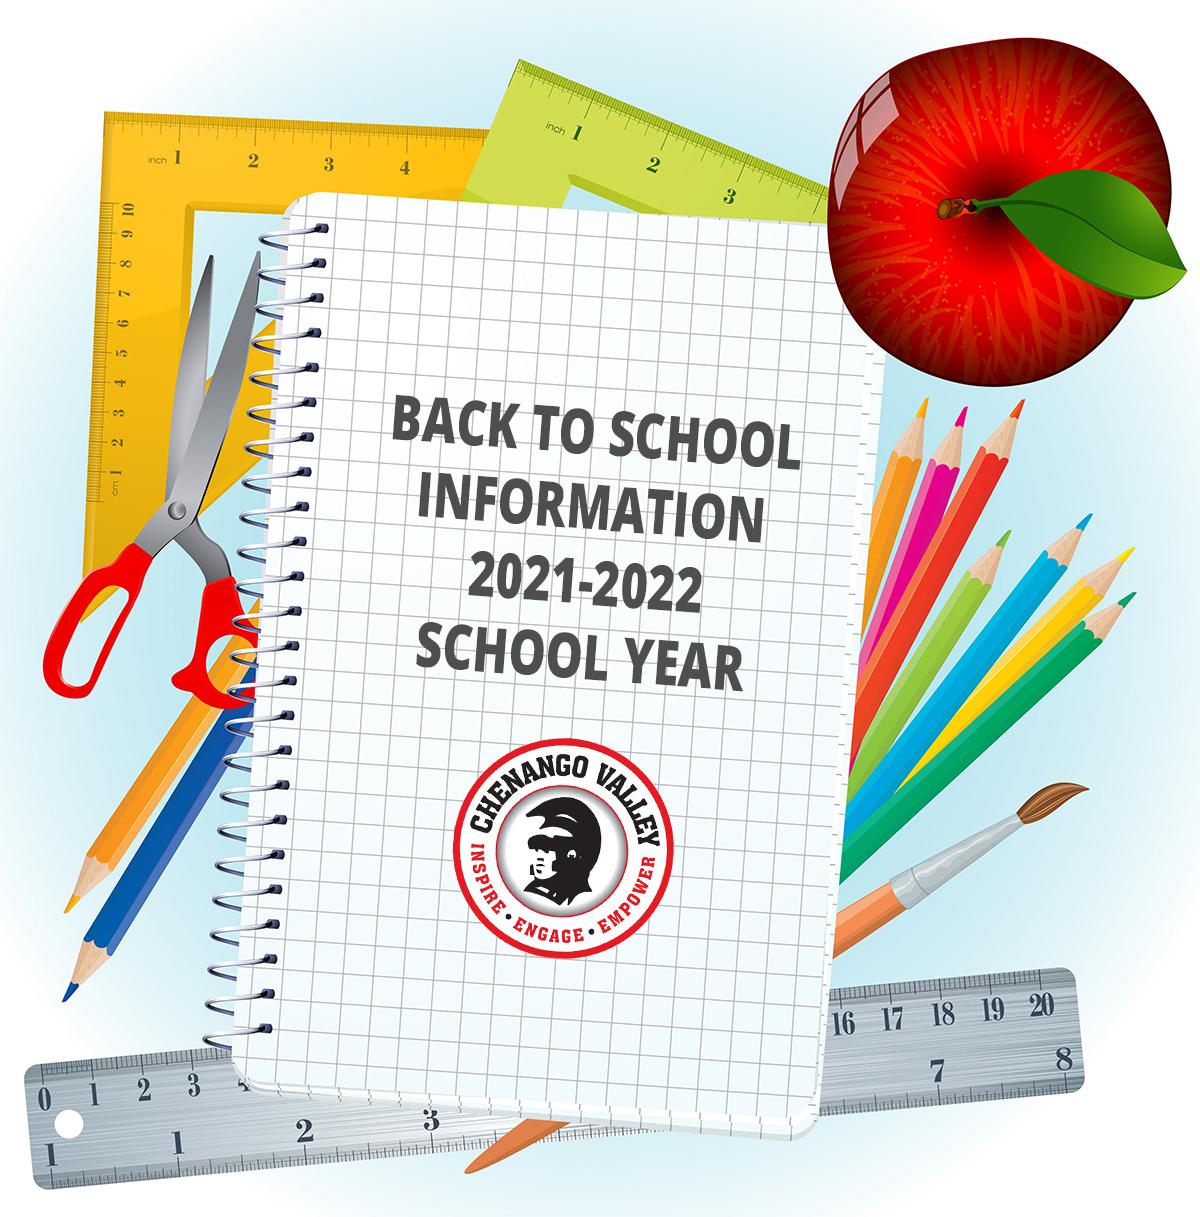 Back to school information 2021-2022 school year